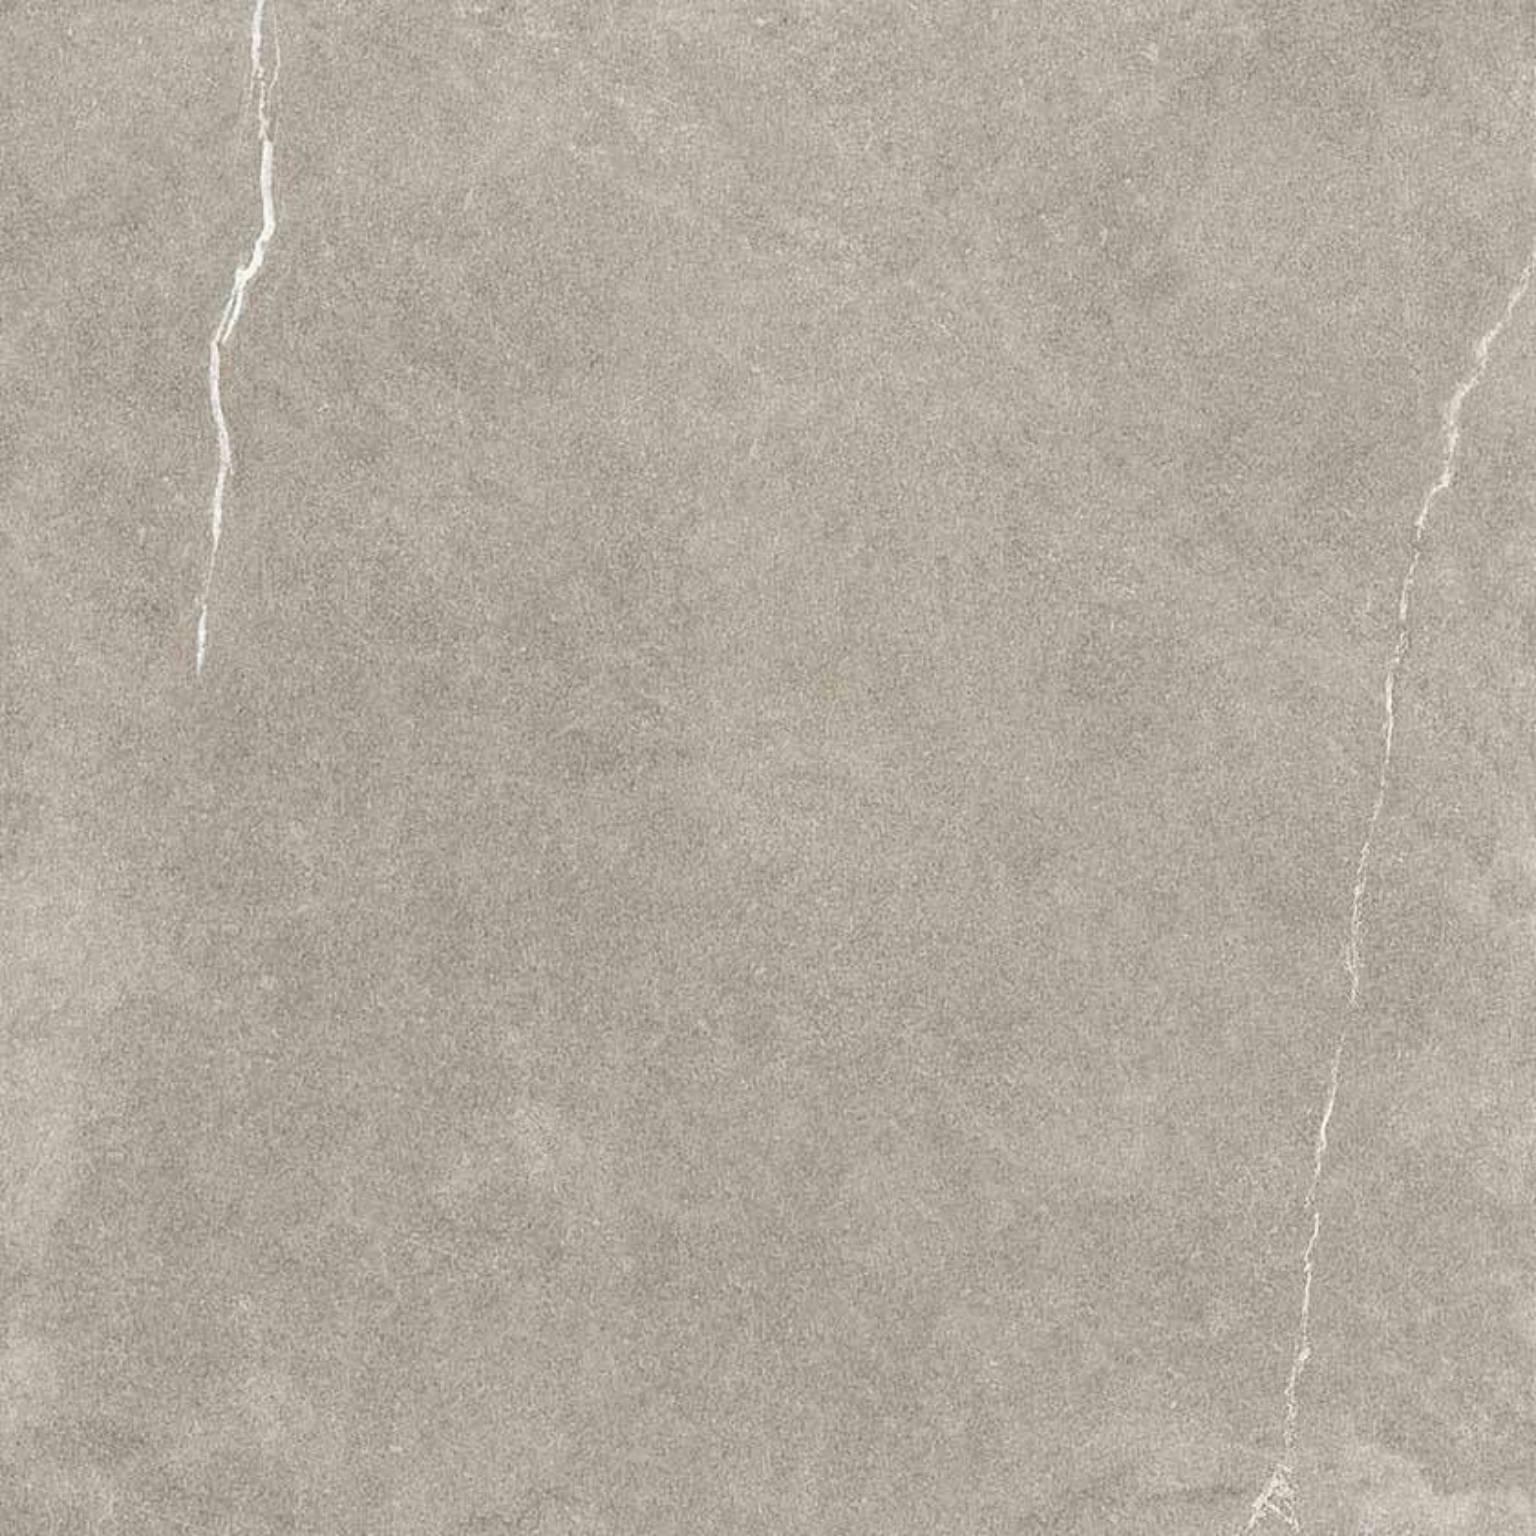 BASE ALBAROC GALENA | Porcemall